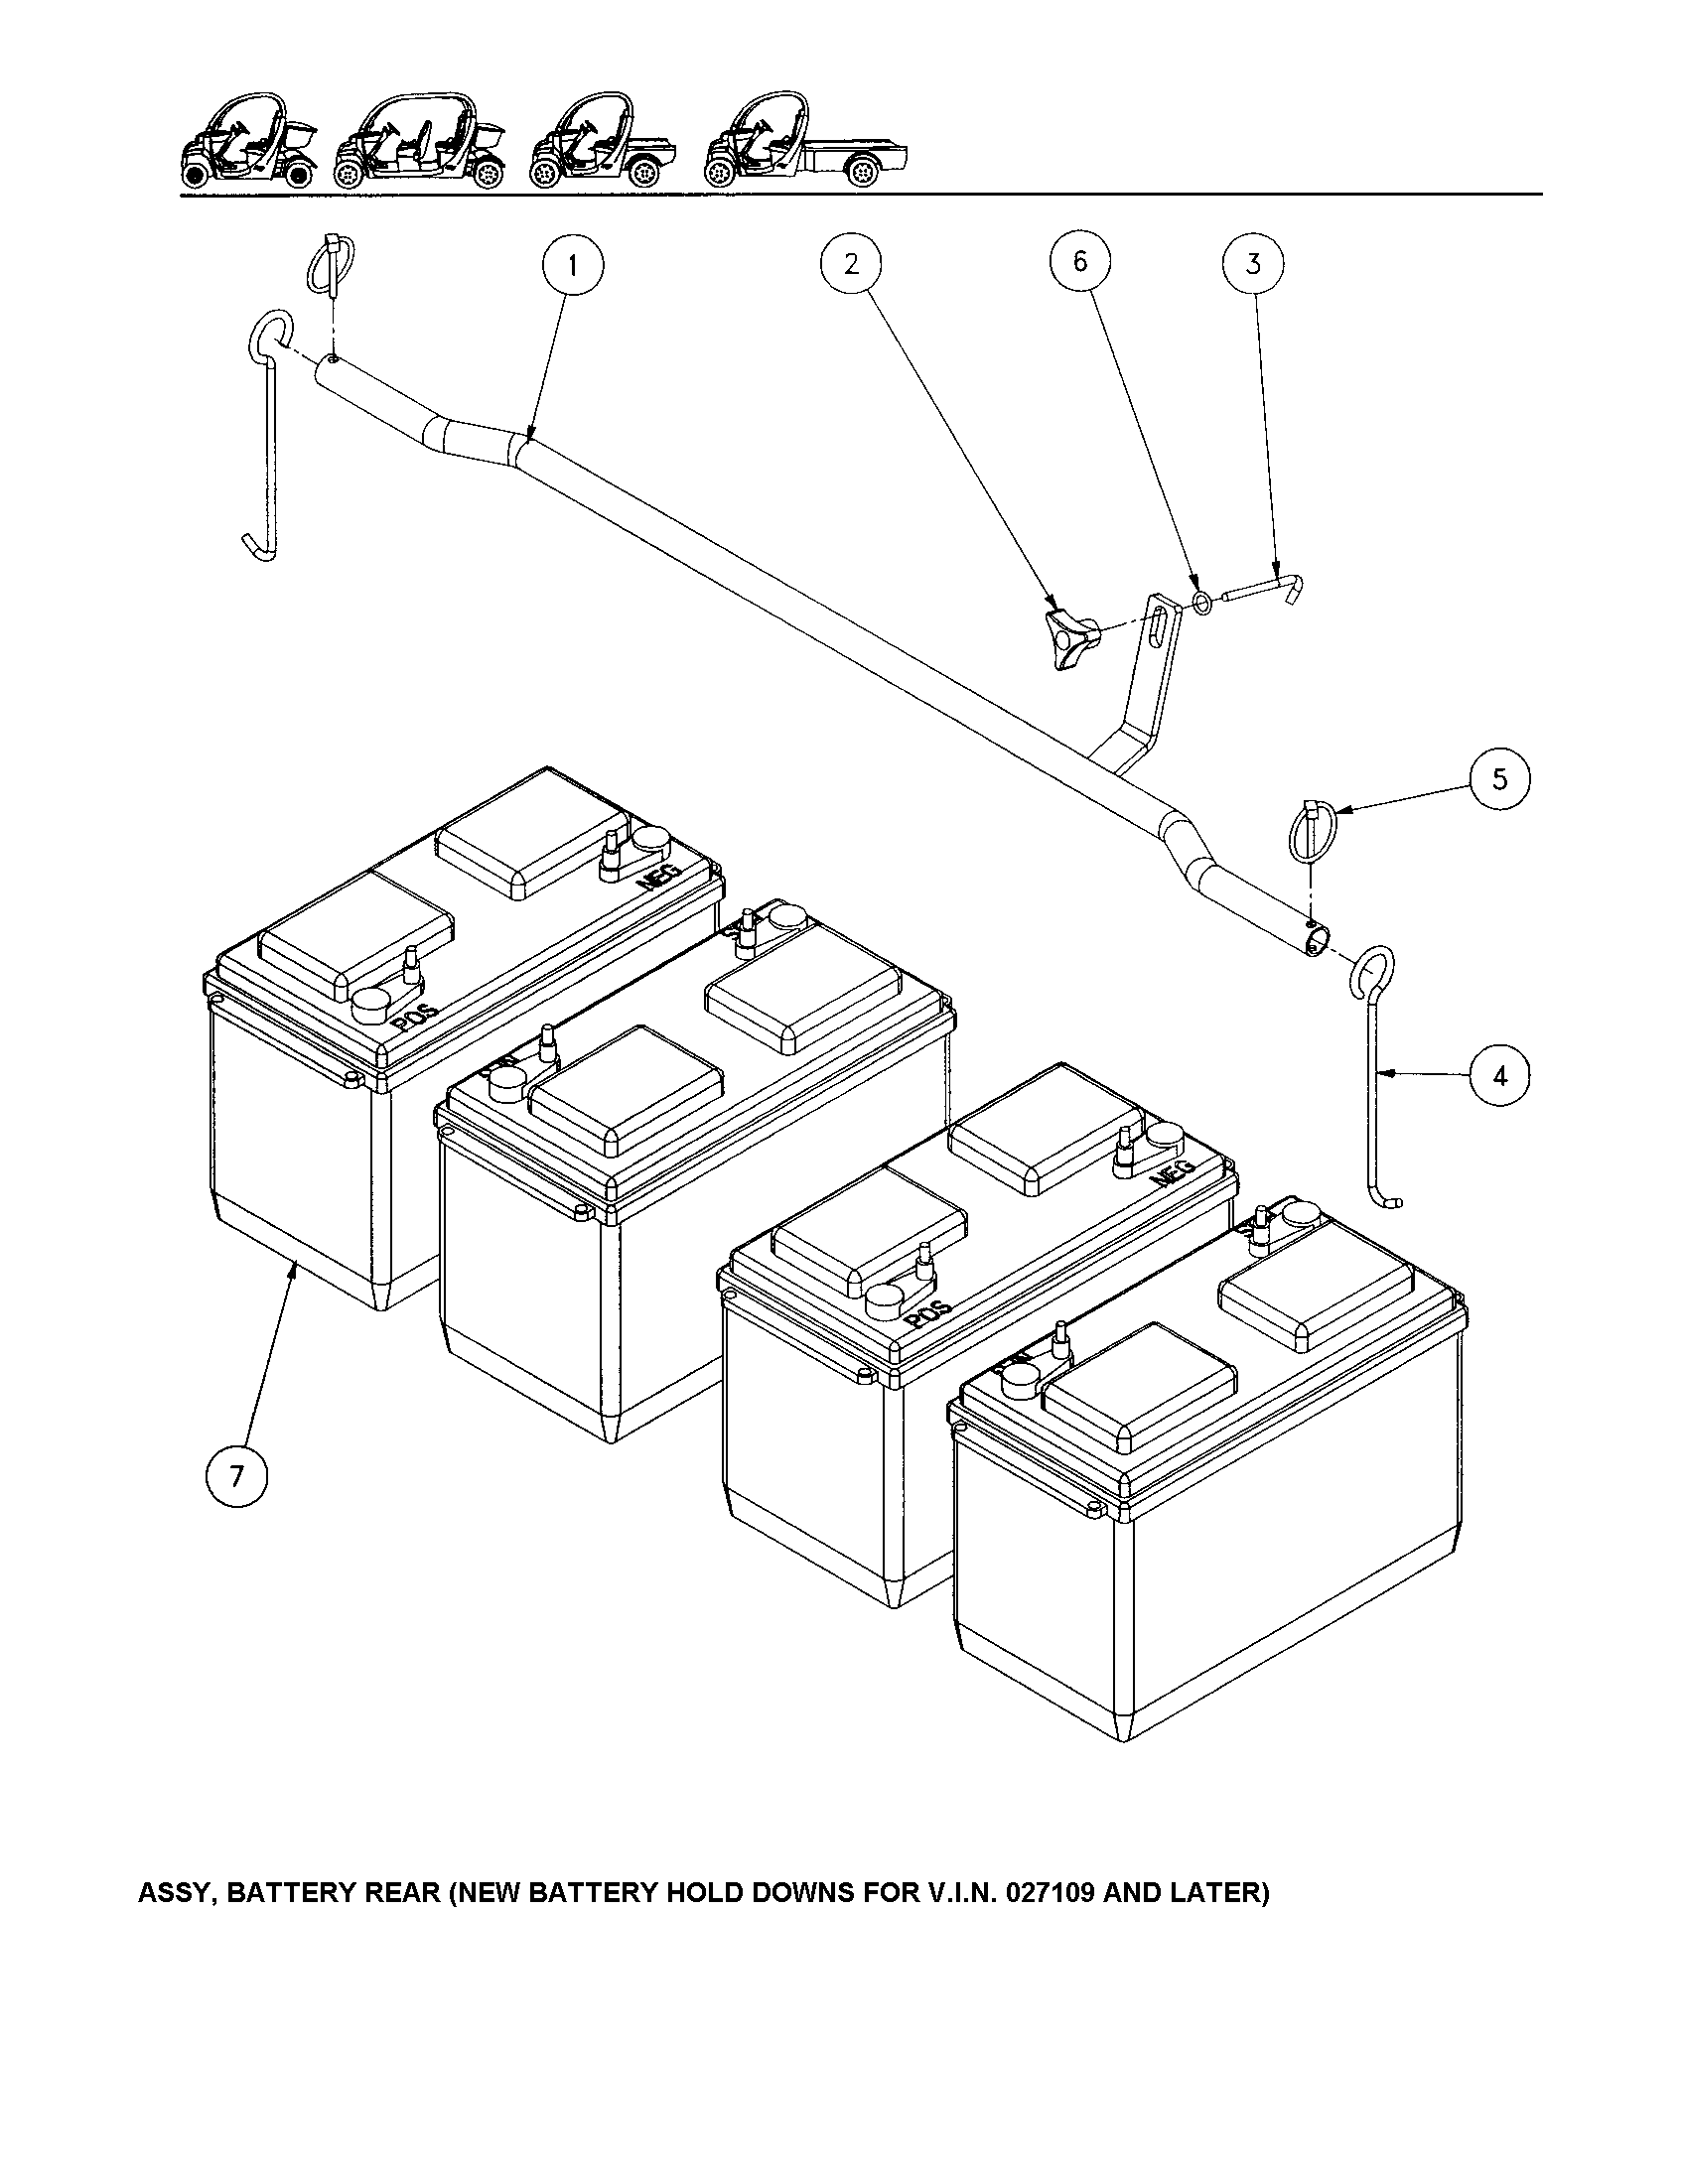 Gem Wiring Diagram 2002 - O2 Sensor 2004 Silverado Fuse Box Diagram for Wiring  Diagram Schematics   Gem E2 Electric Vehicle Wiring Diagram      Wiring Diagram Schematics